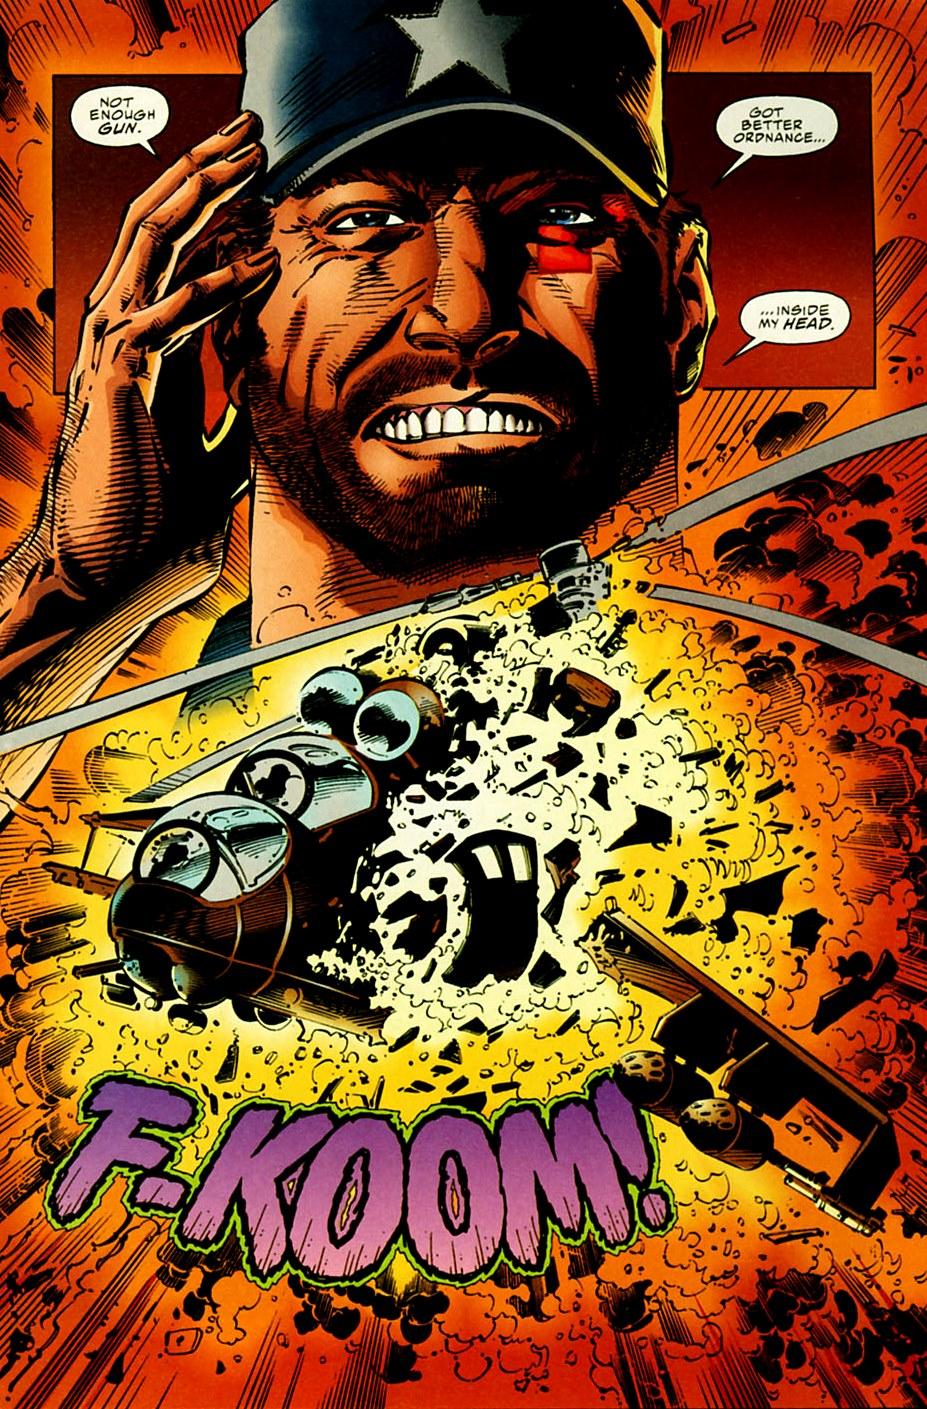 Stephen Callahan (Wildstorm Universe)